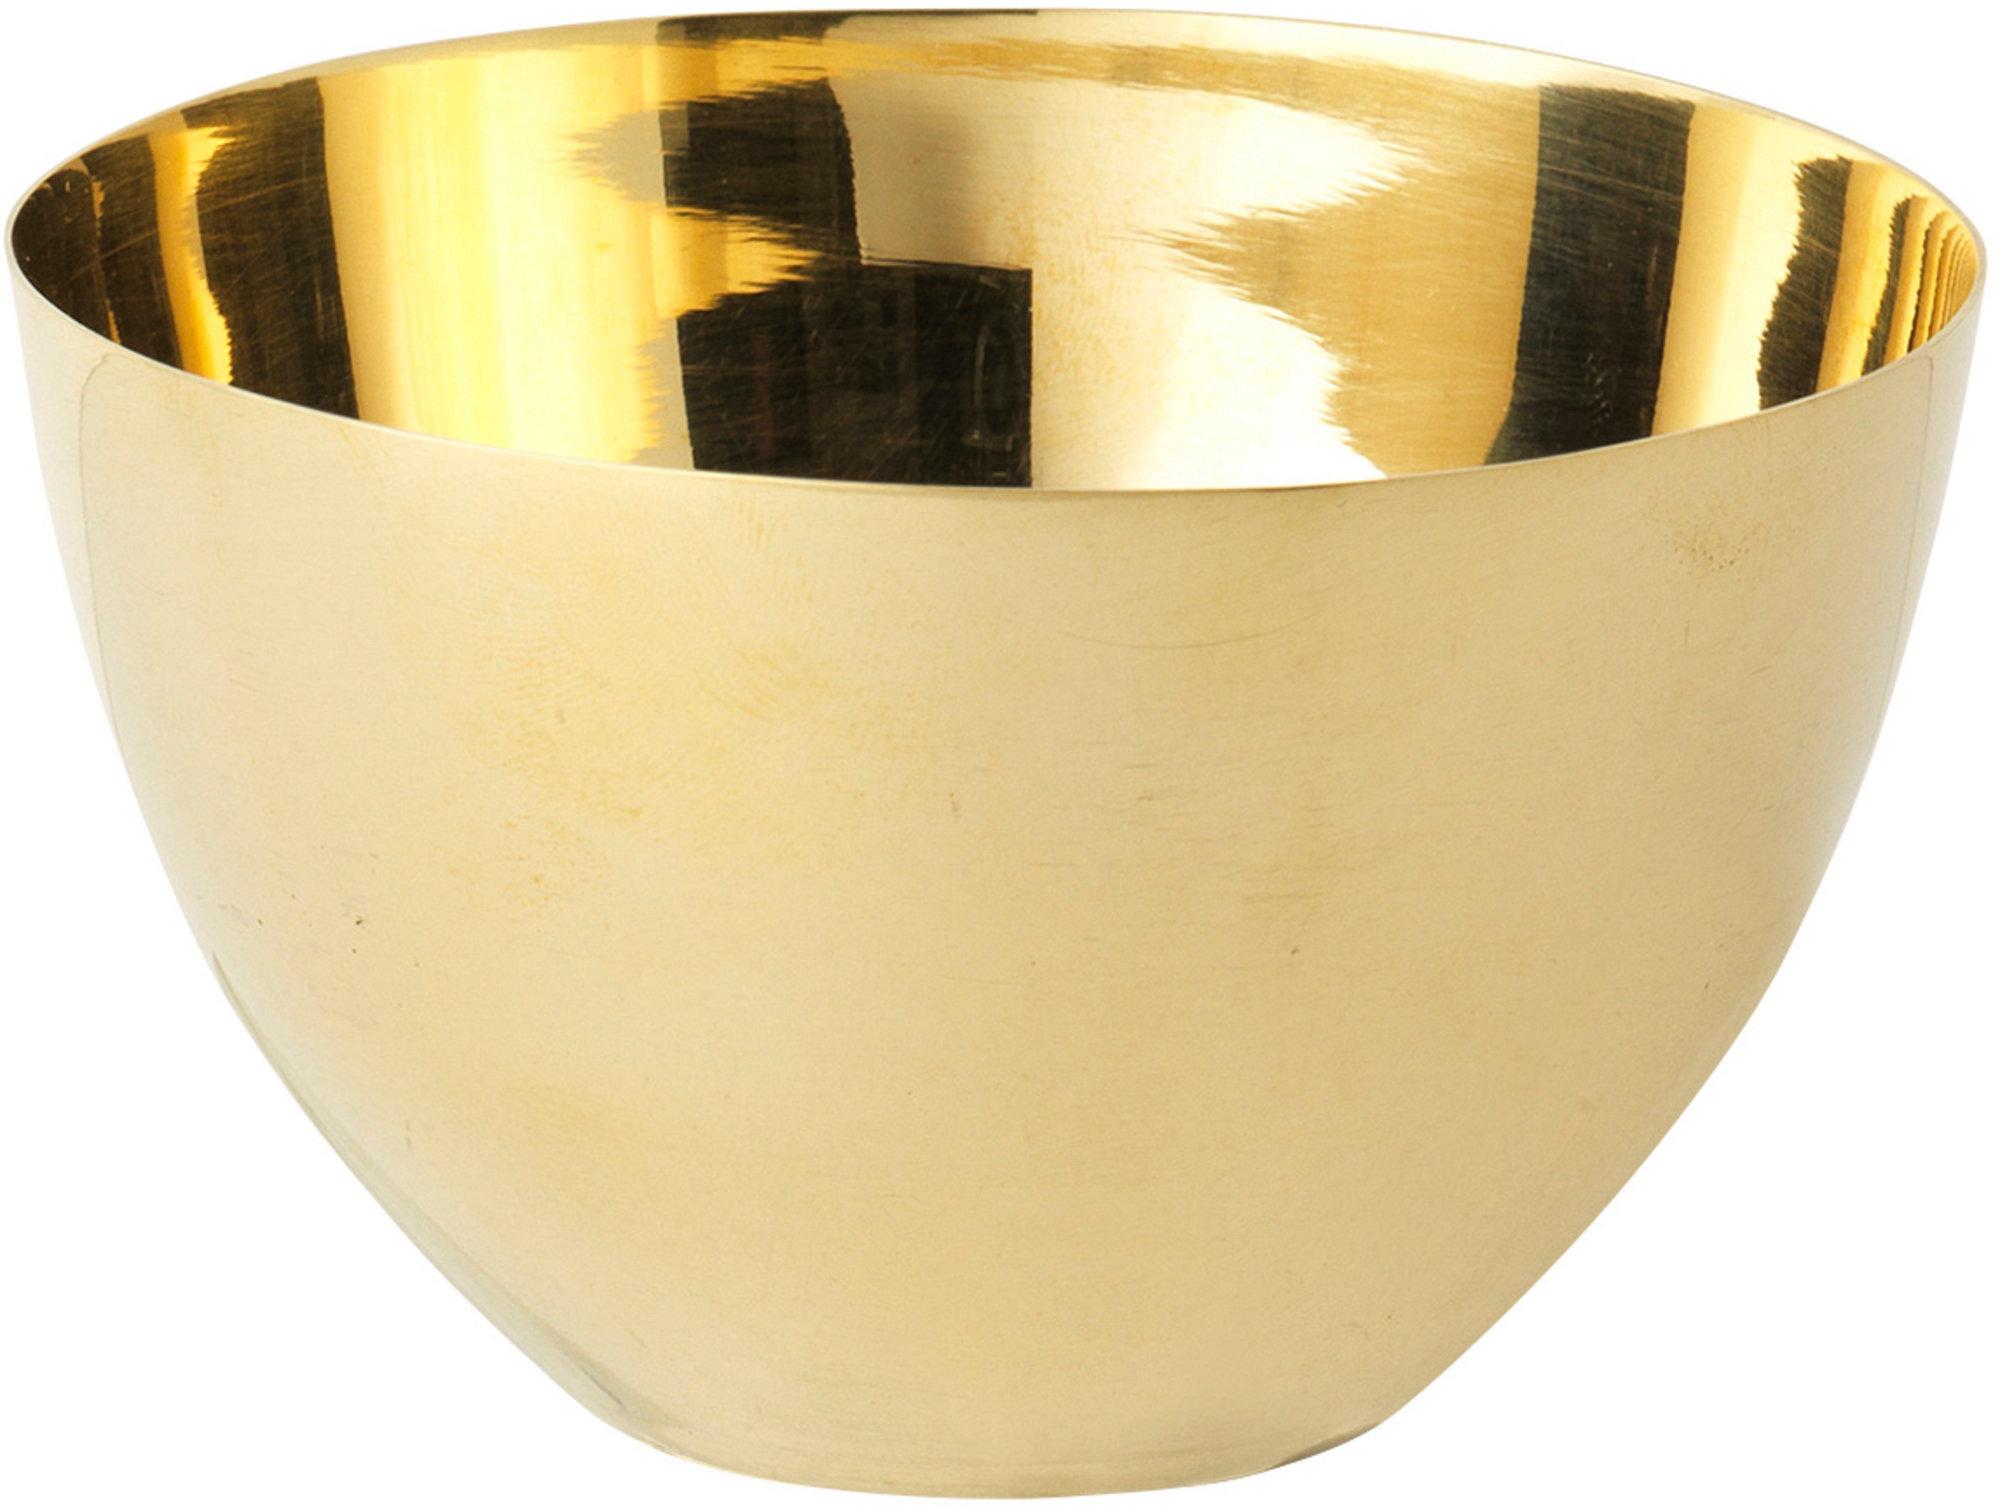 Caffenu 'Joan' skål i mässing, 8 cm